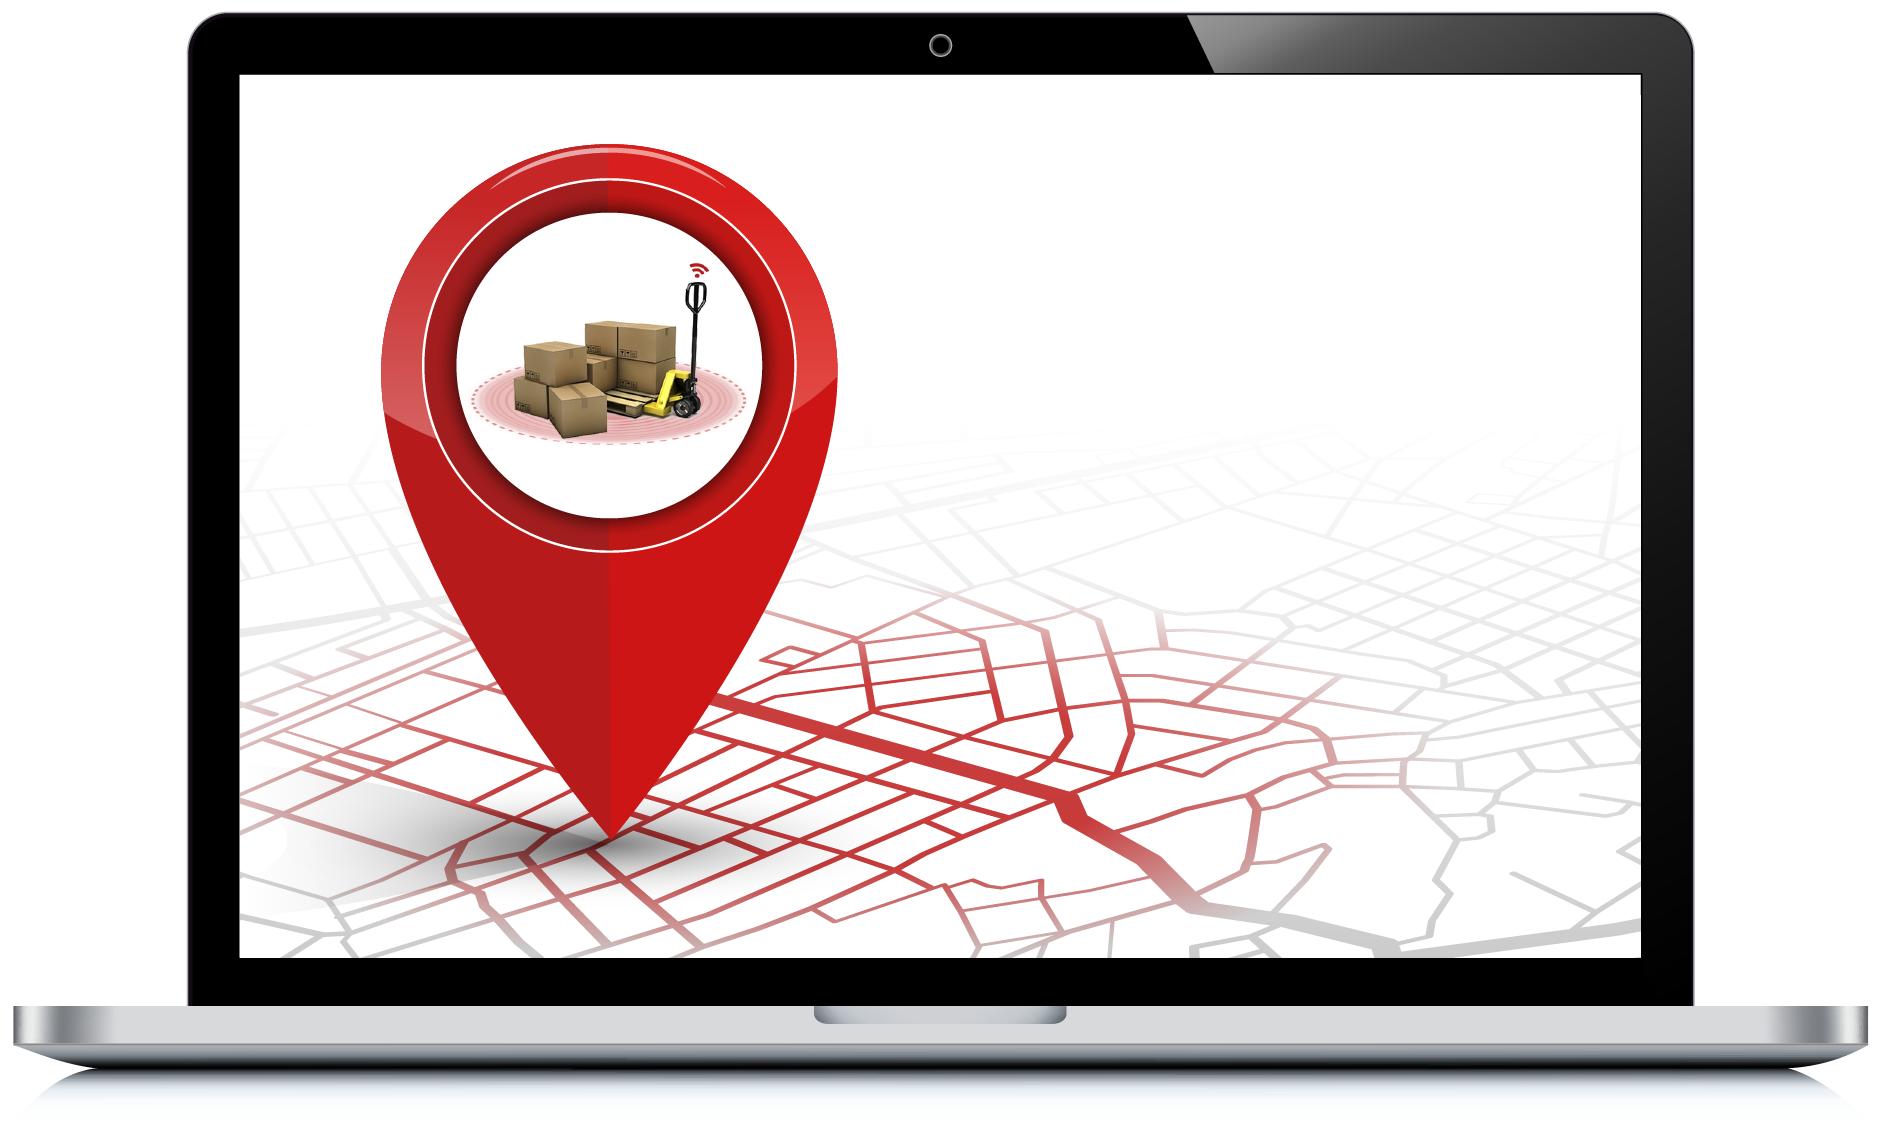 Analytics Tracking Location